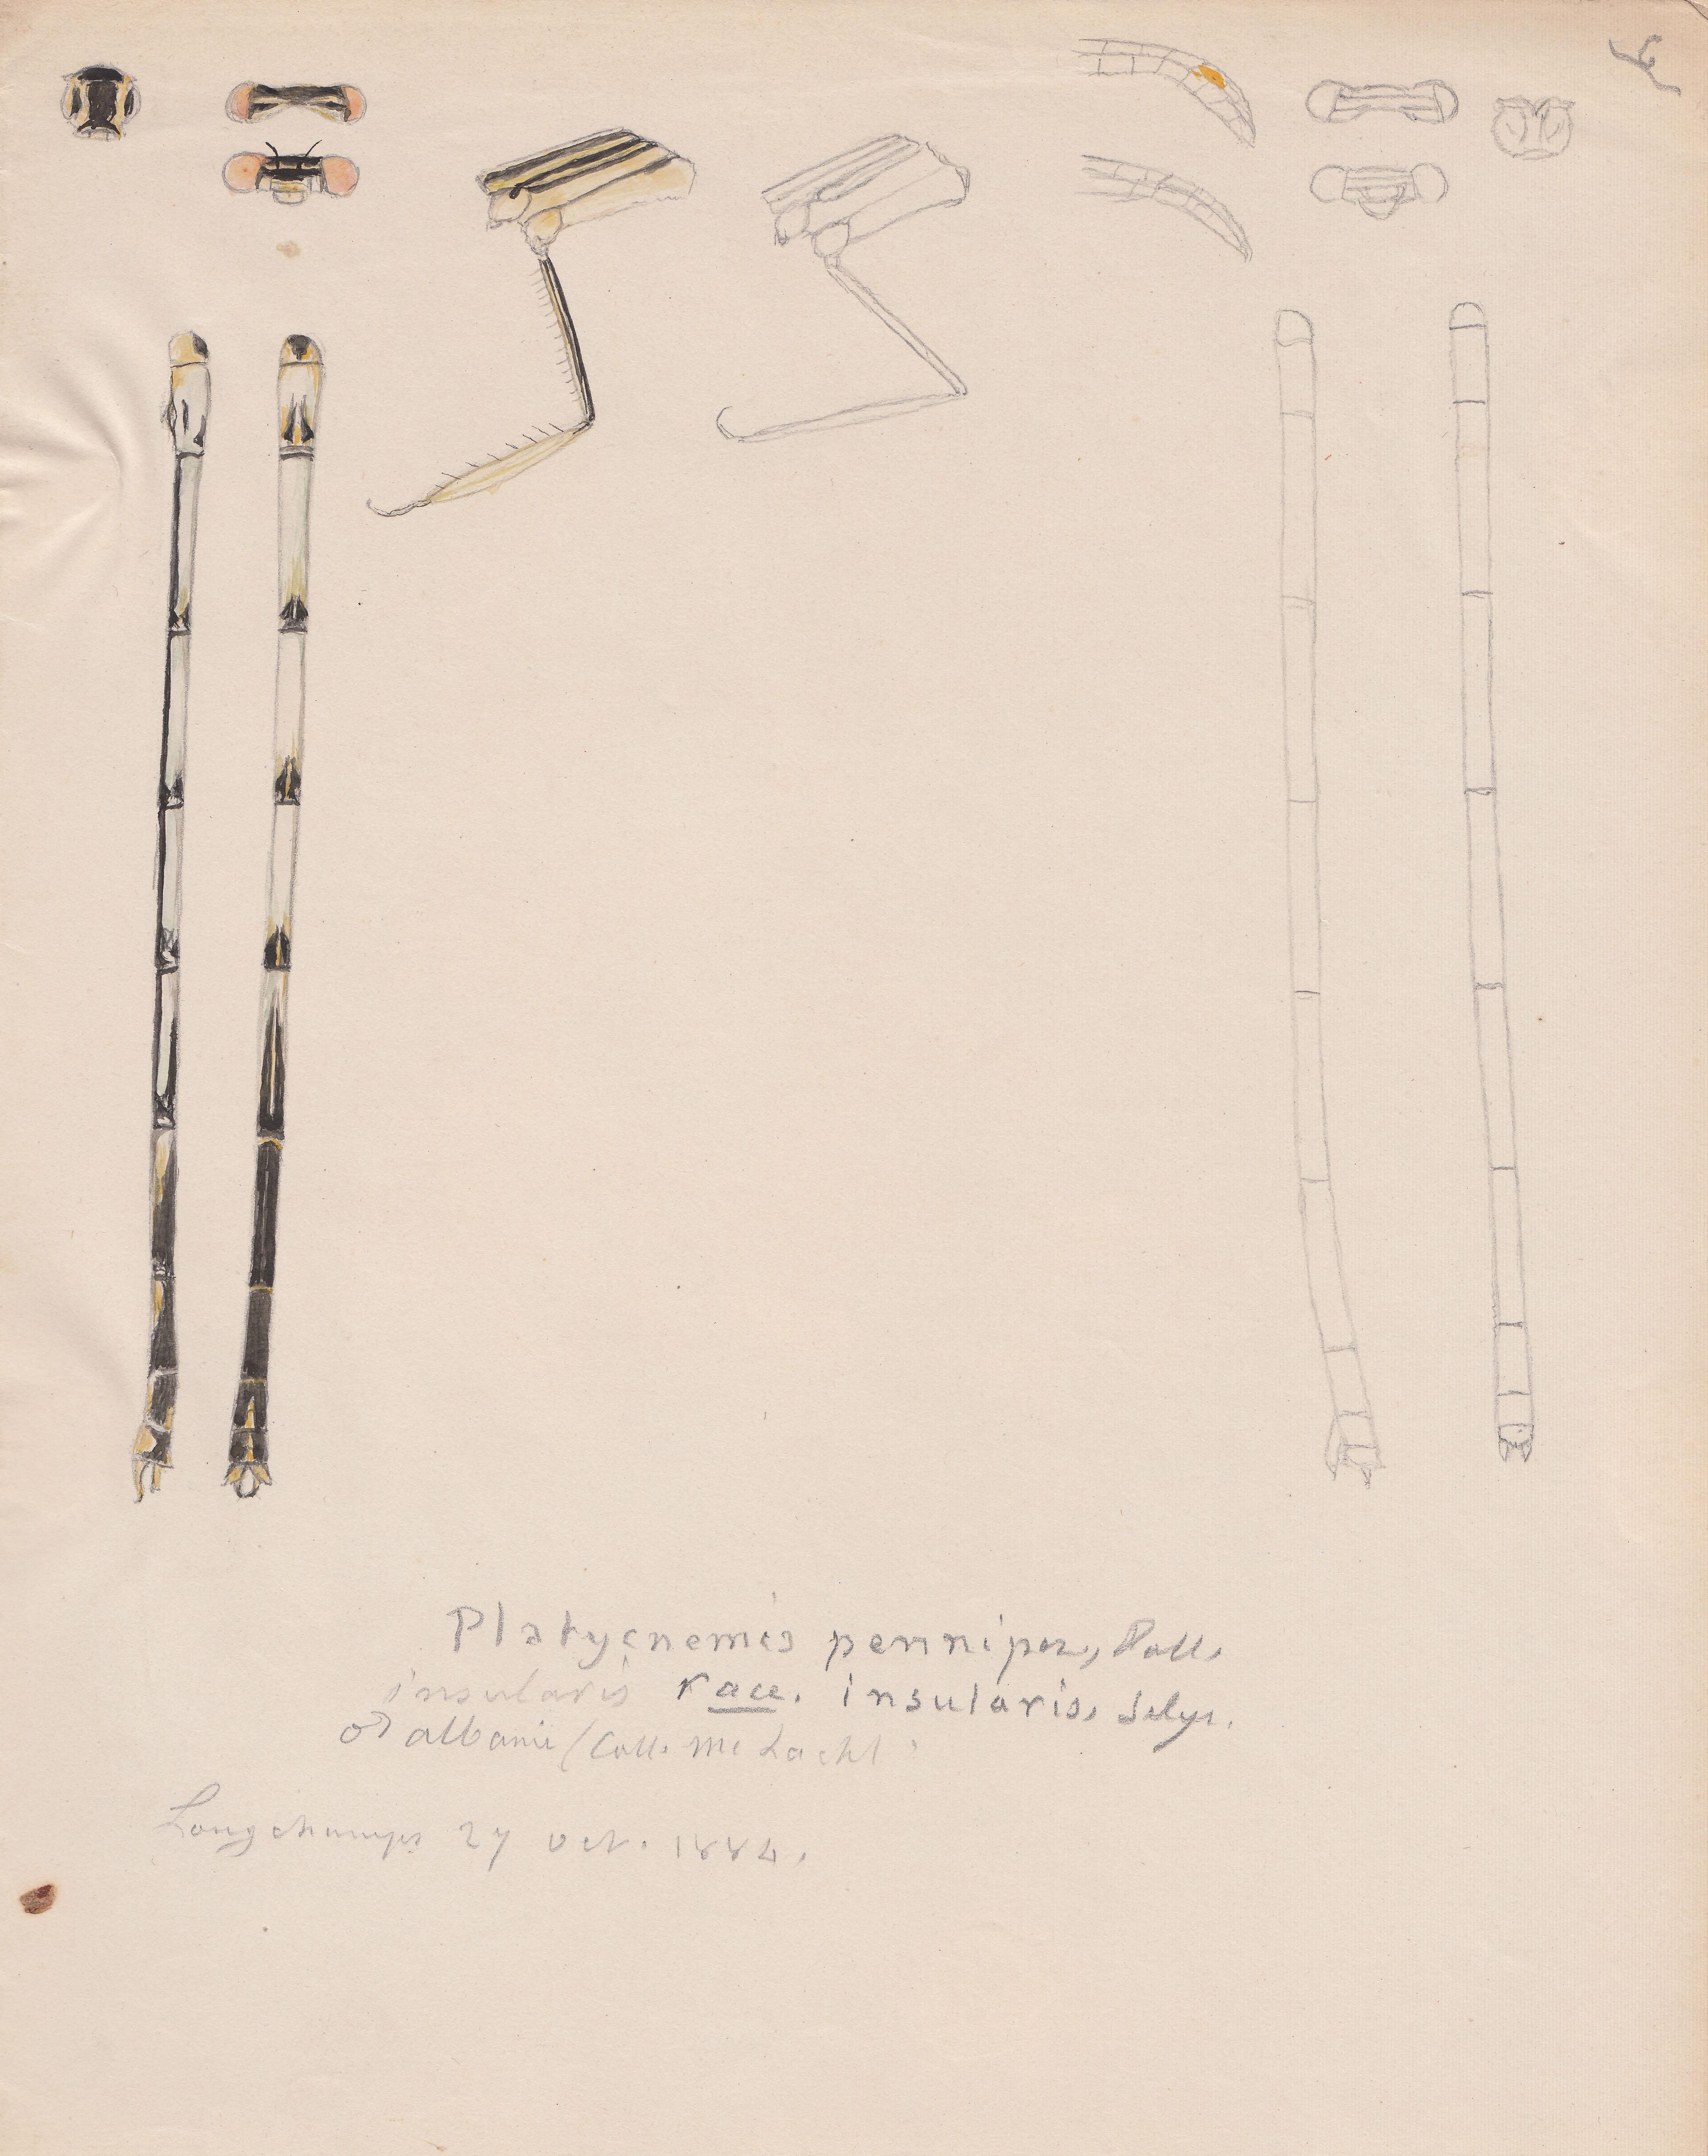 Platycnemis pennipes variety insularis.jpg